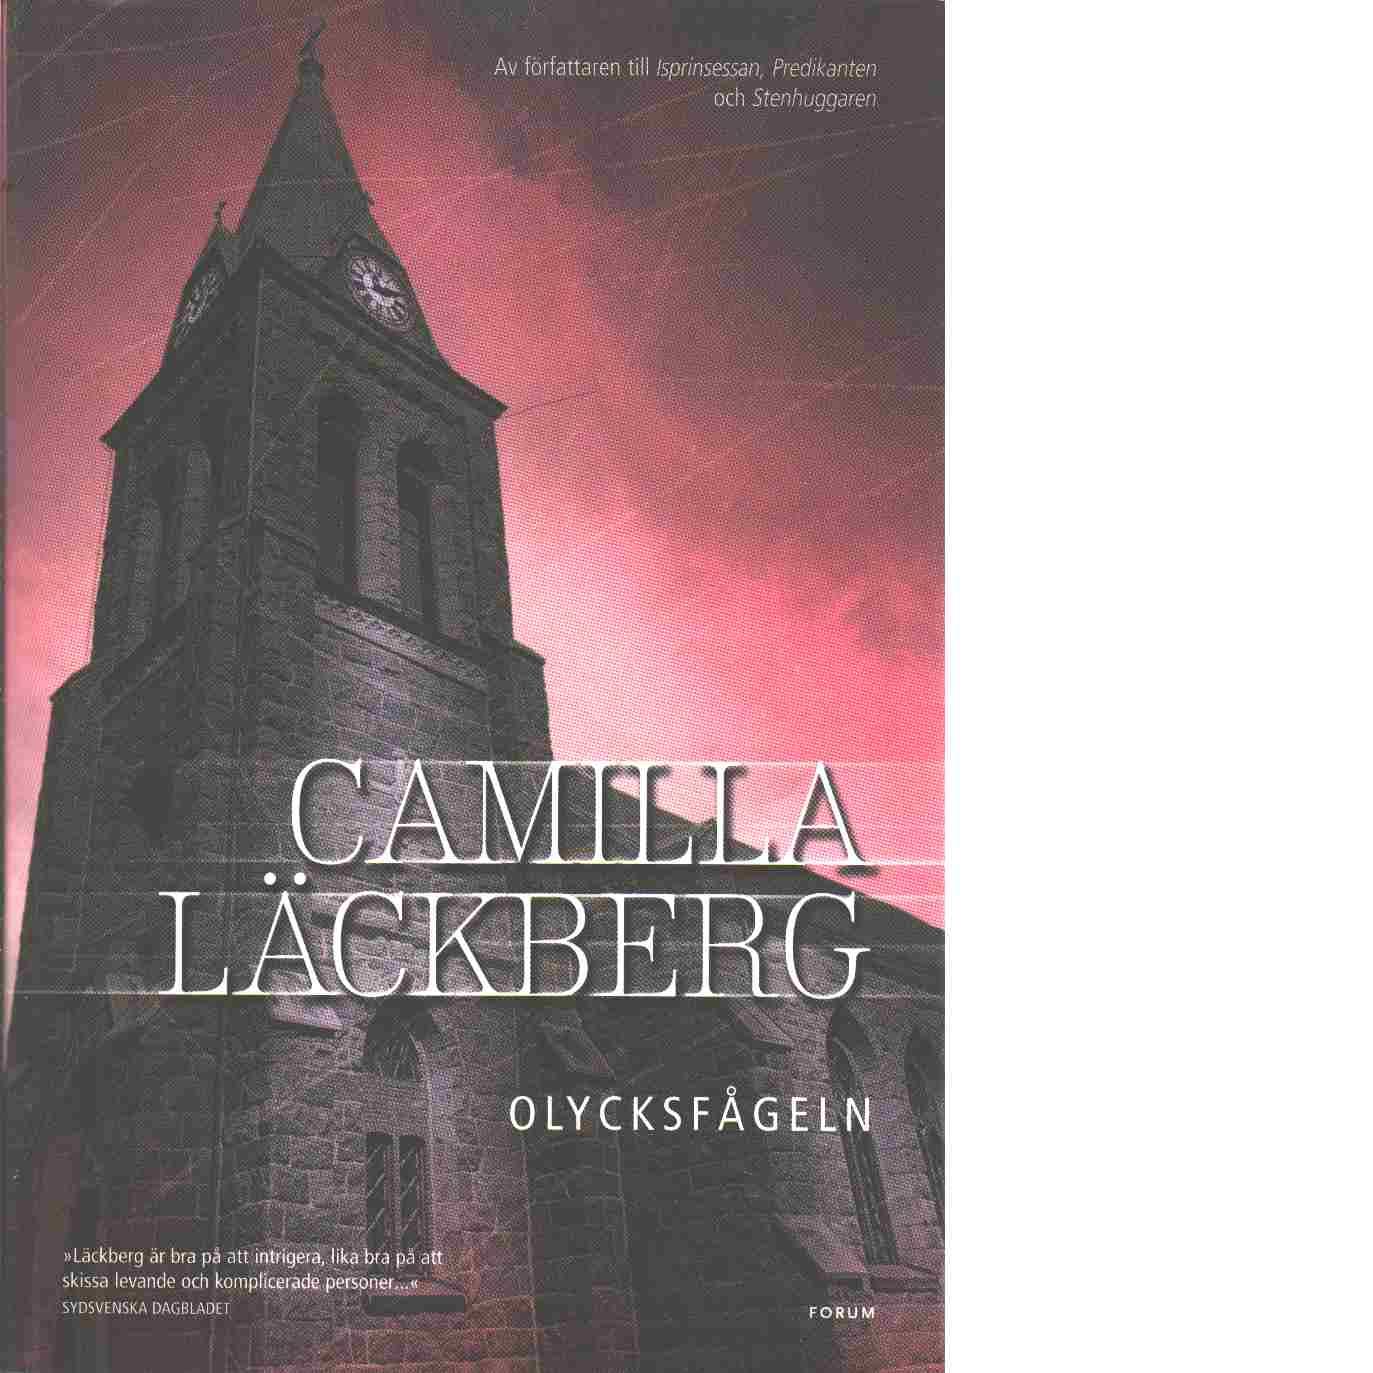 Olycksfågeln - Läckberg, Camilla